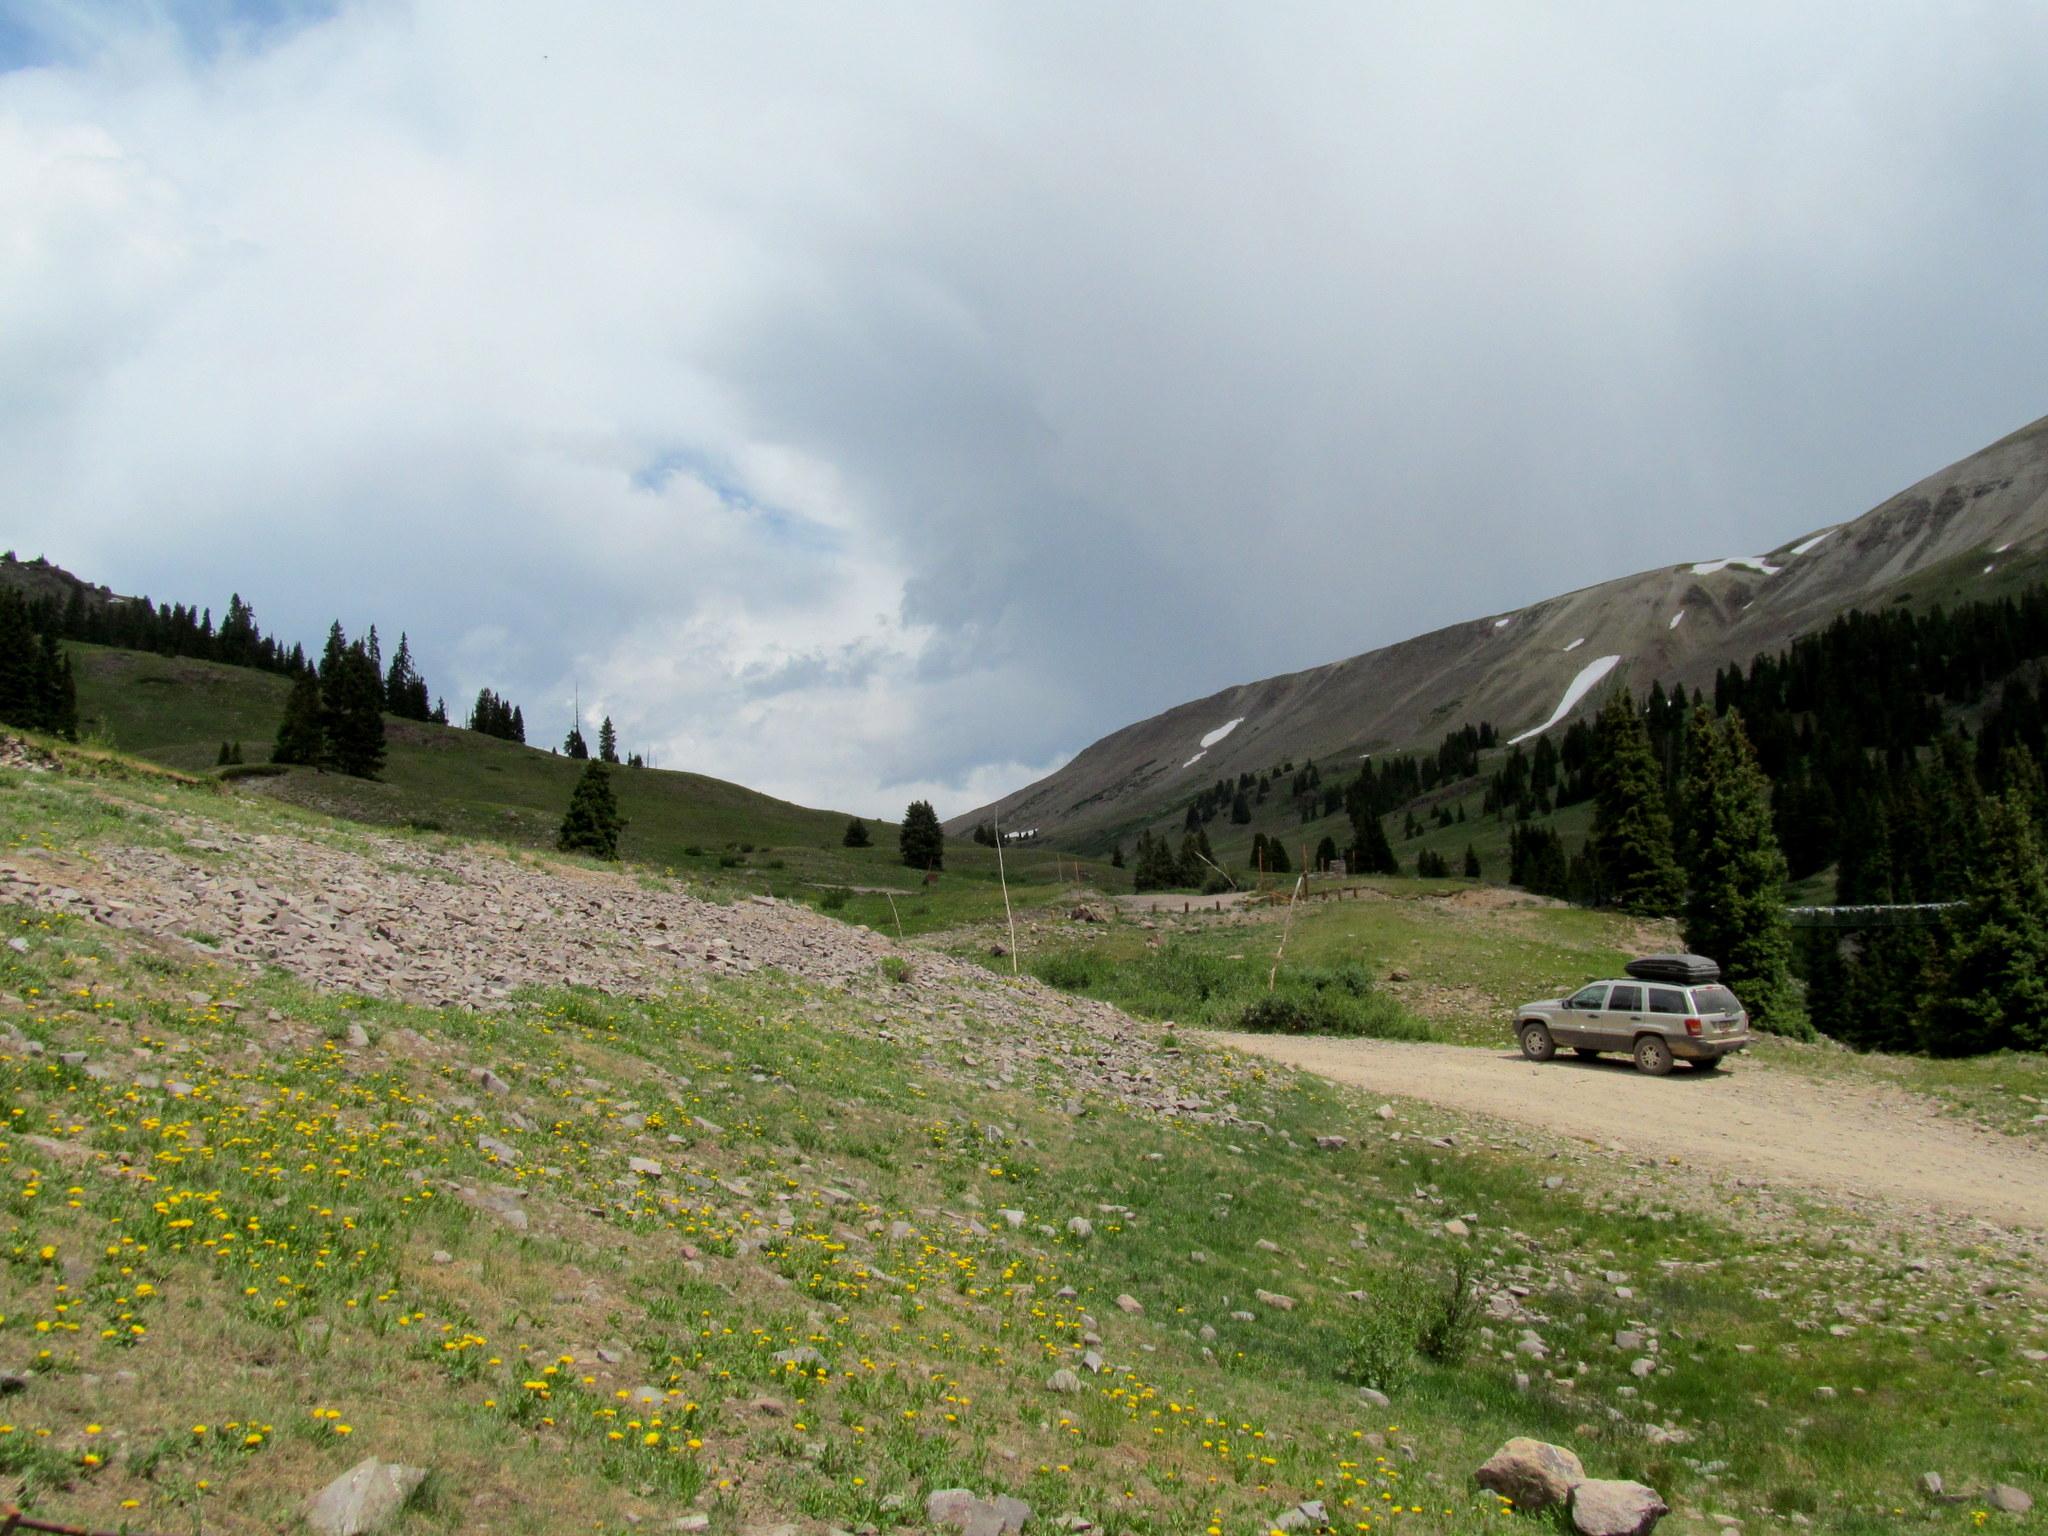 Photo: Starting the climb up to Engineer Pass